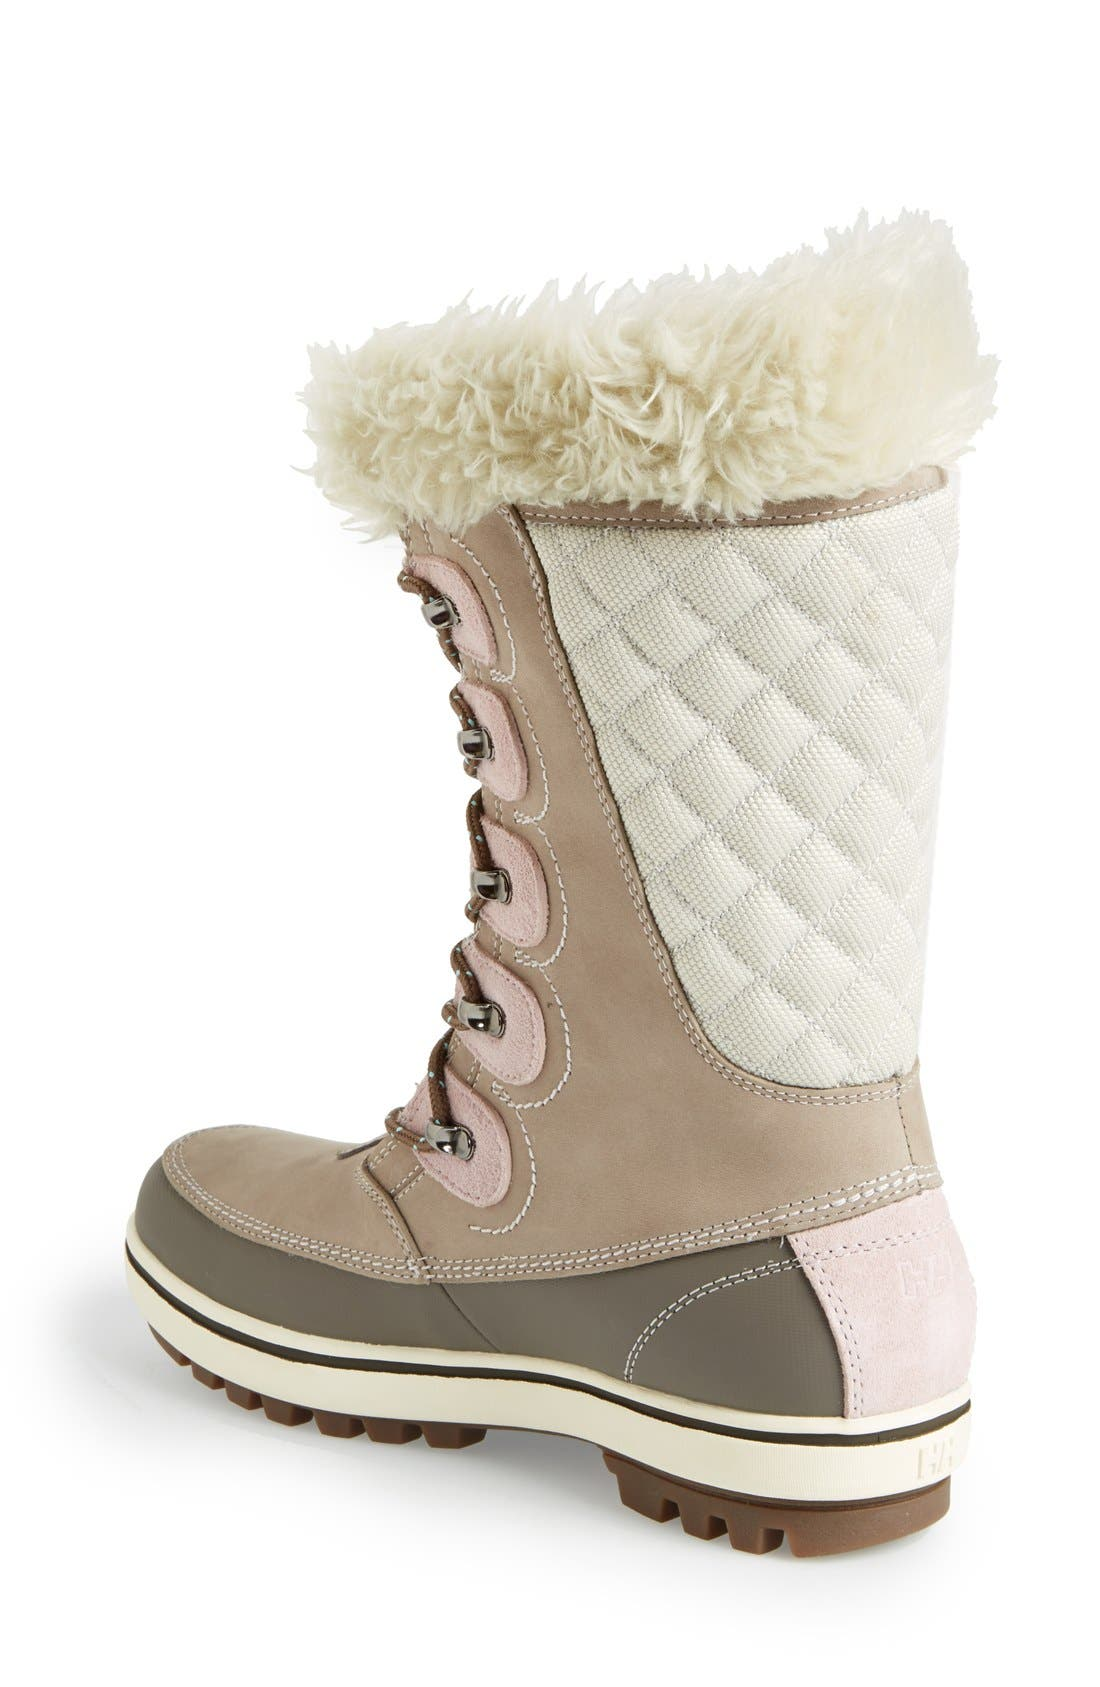 Alternate Image 2  - Helly Hansen 'Garibaldi' Waterproof Snow Boot (Women)